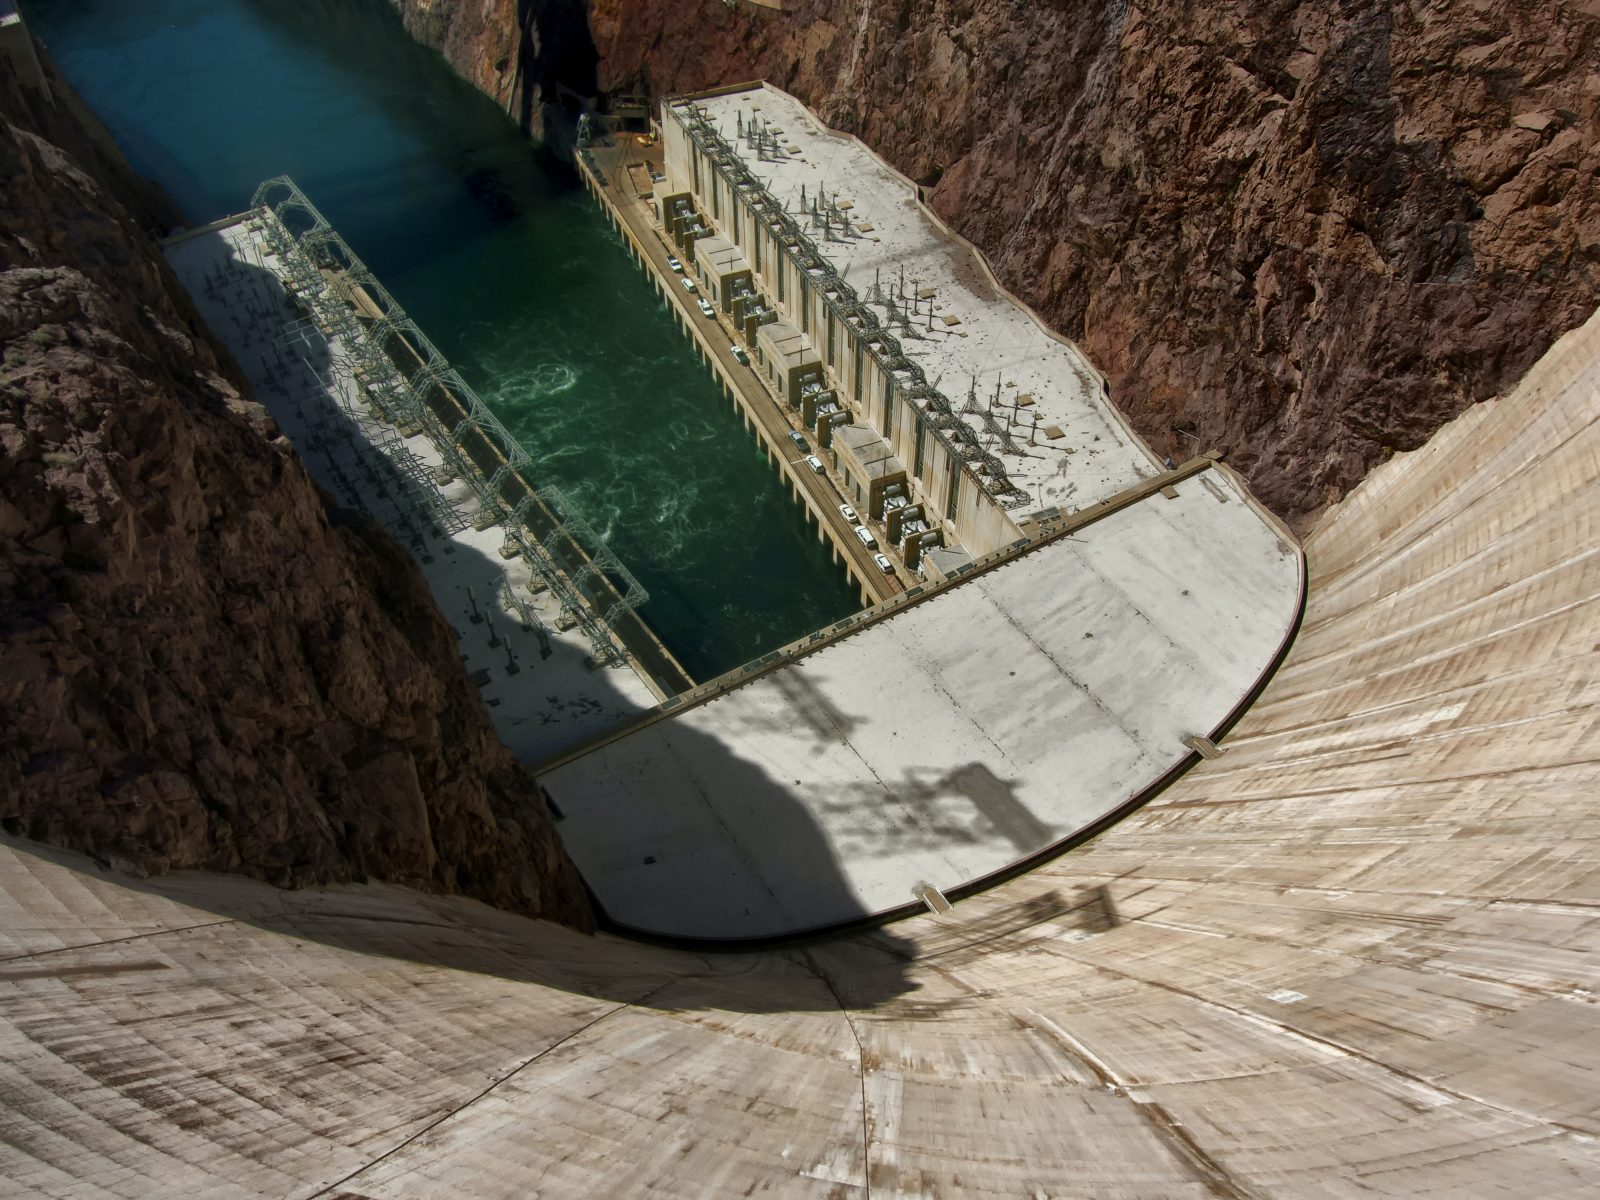 Hoover Damn, Nevada